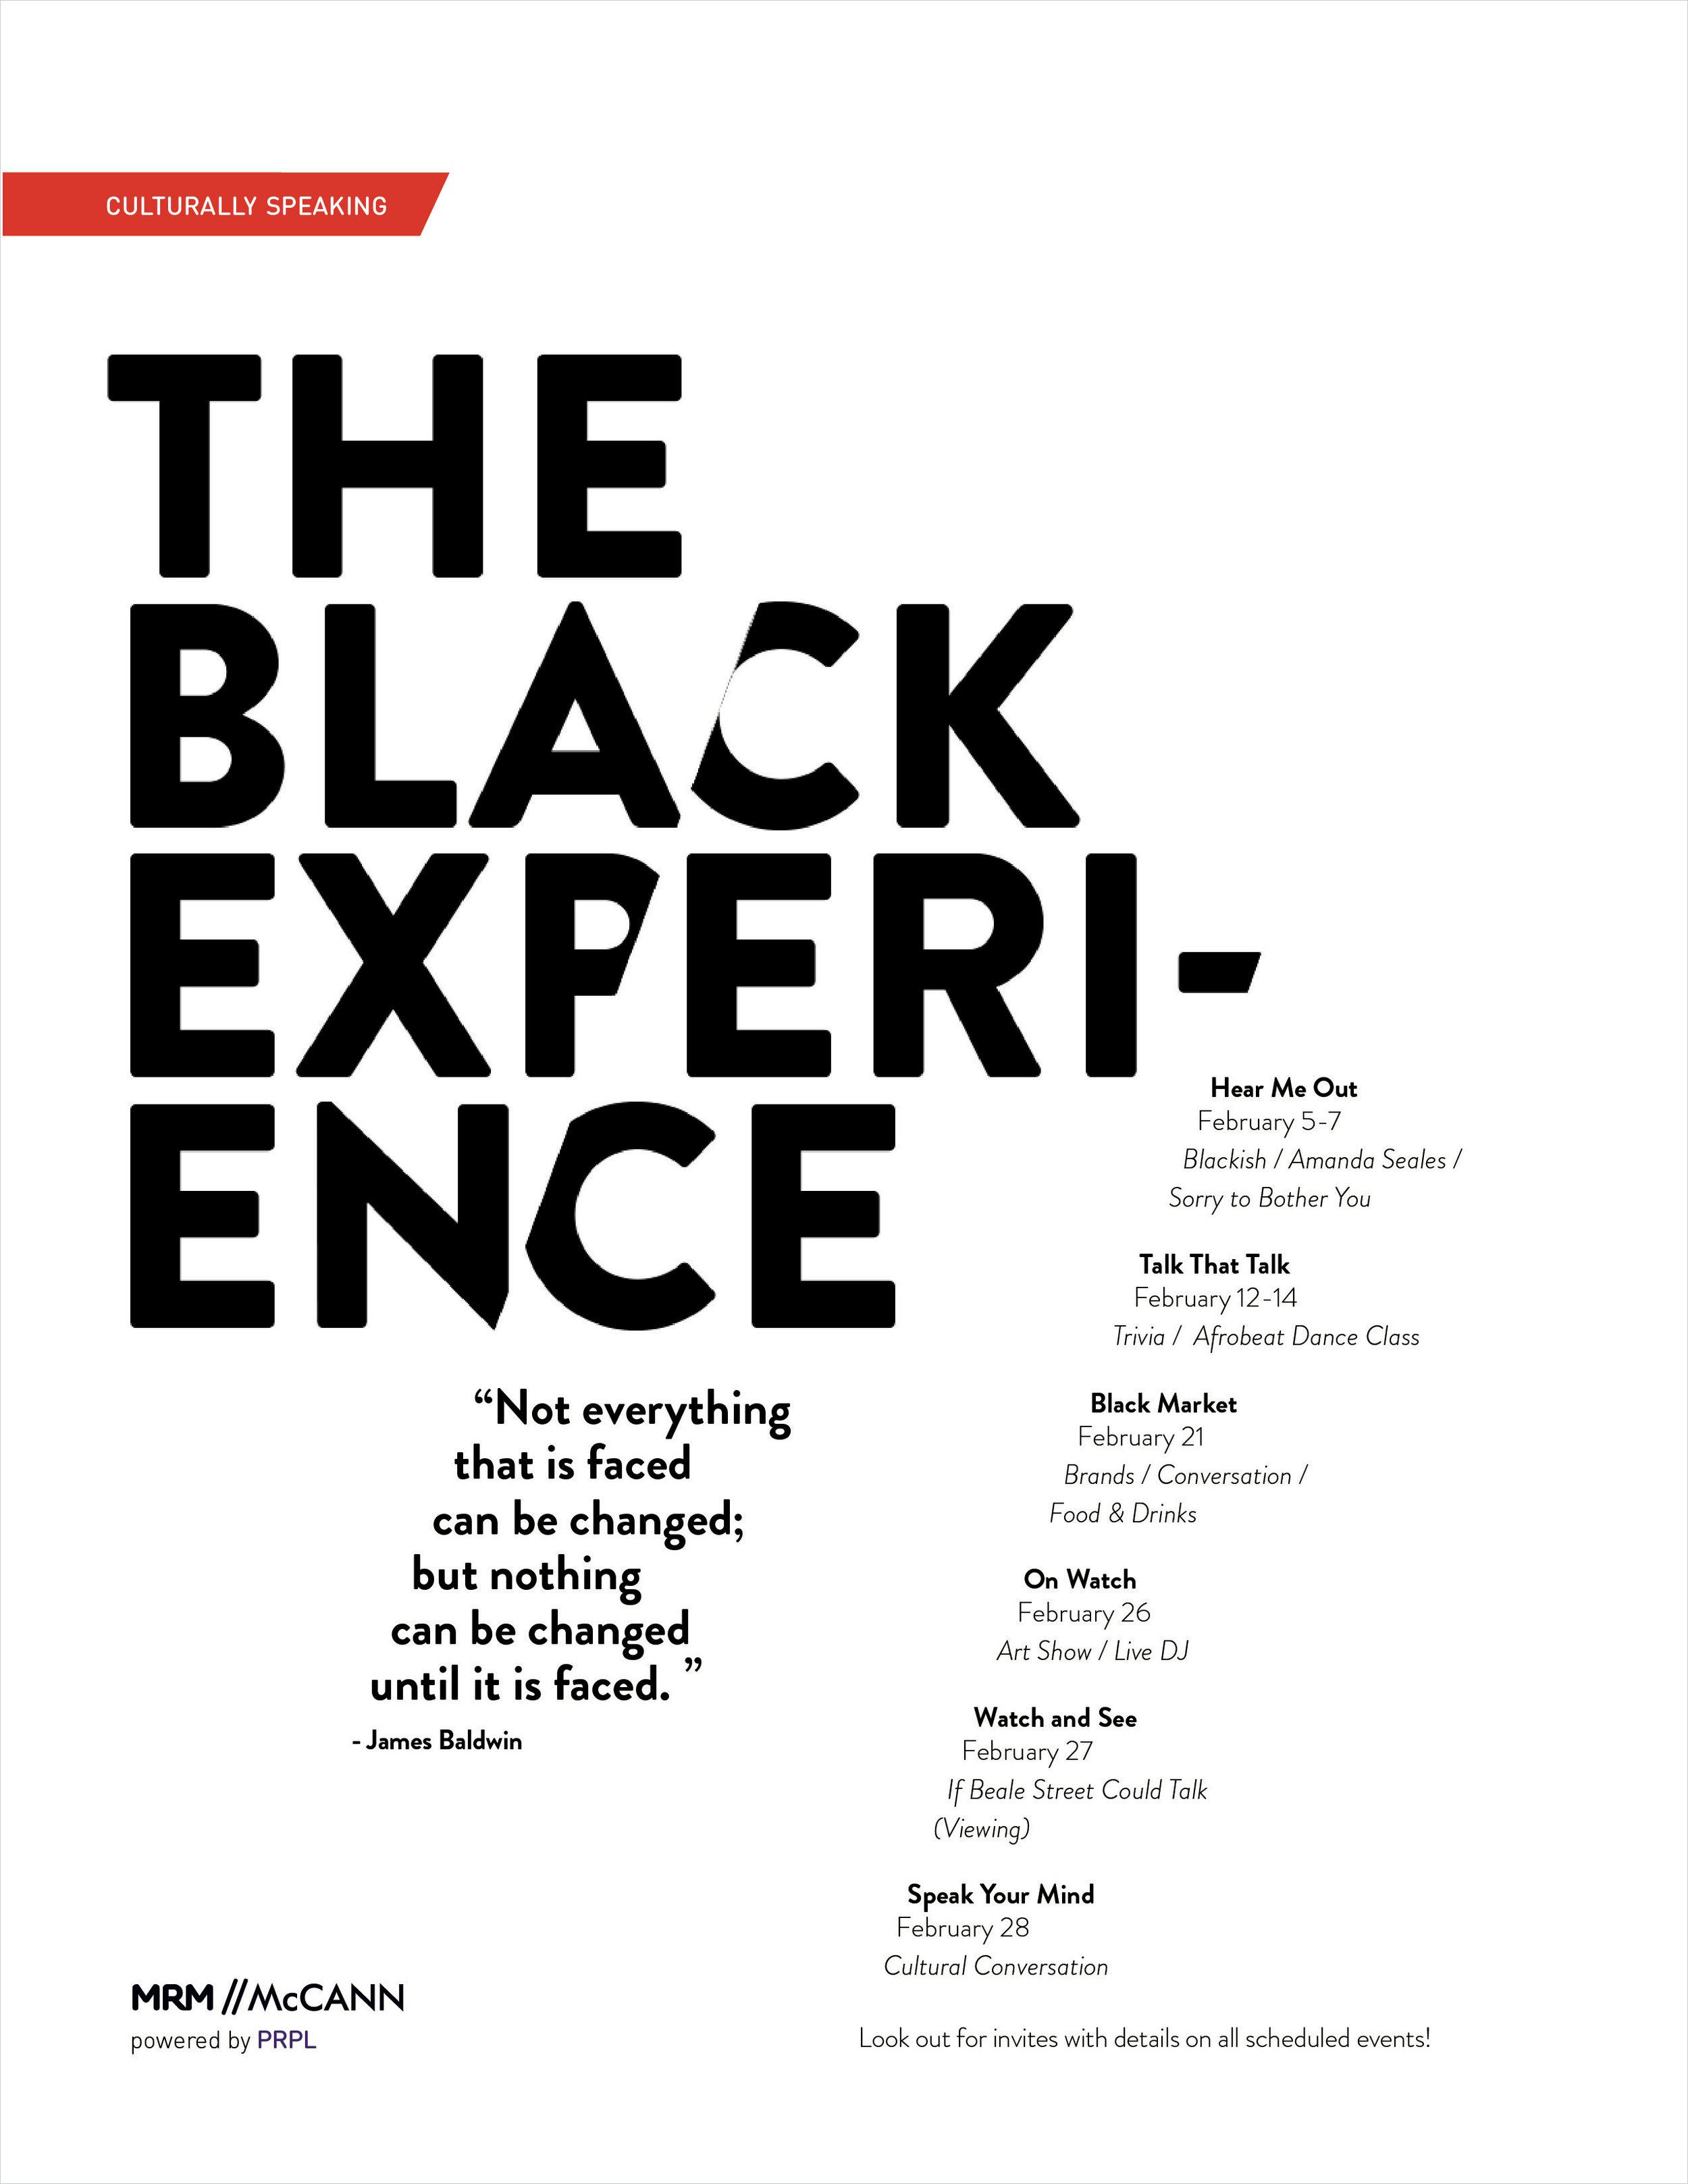 black-history_V2-01.jpg